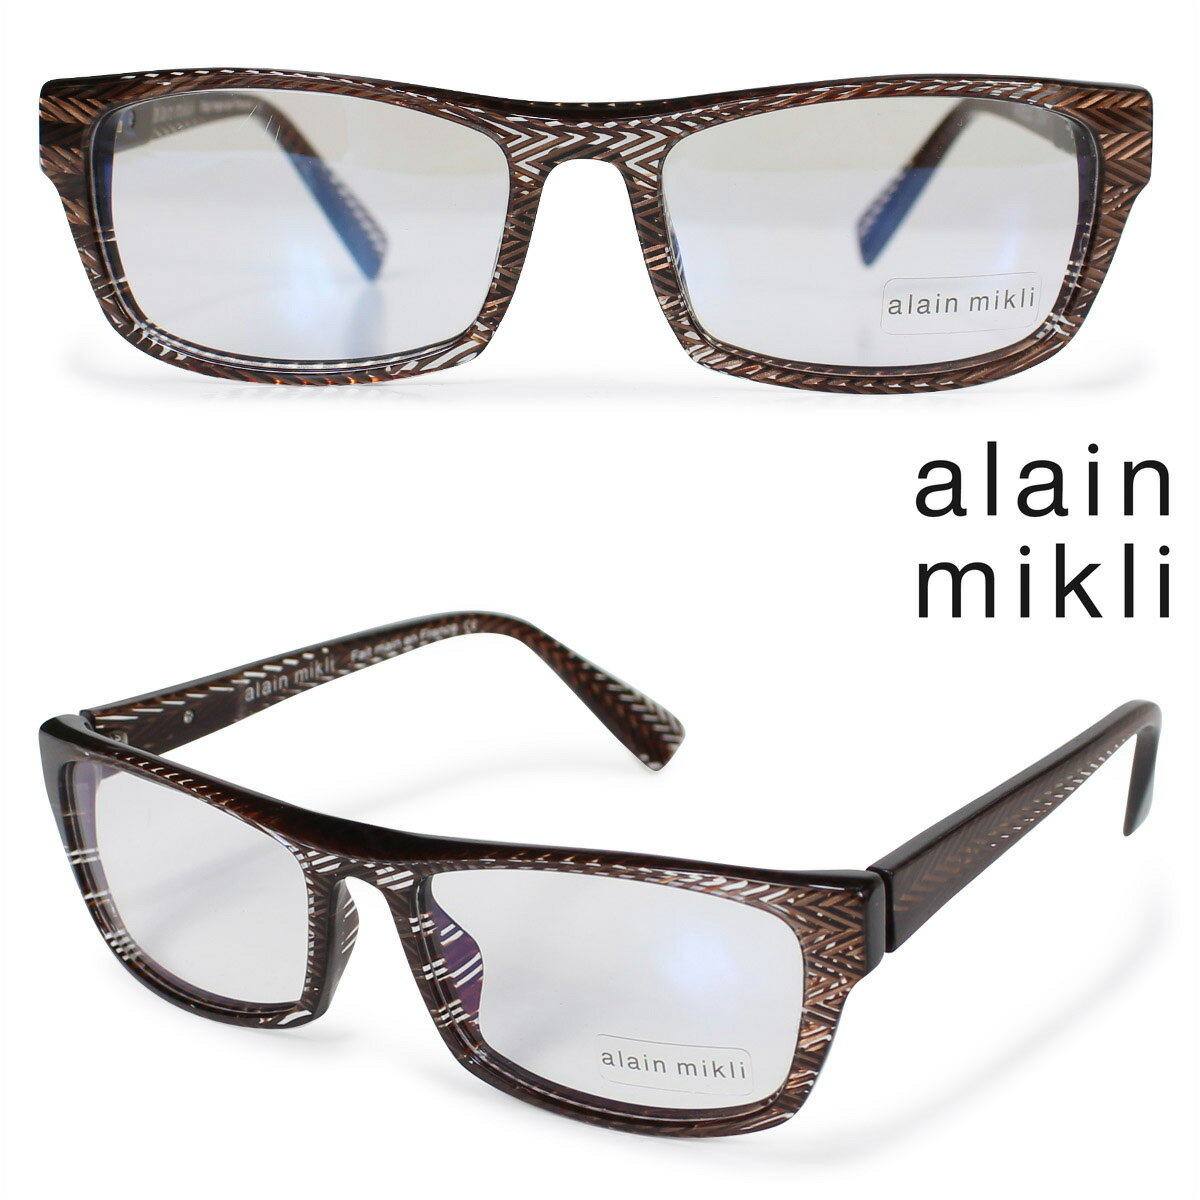 alain mikli アランミクリ メガネ メガネフレーム 眼鏡 フランス製 メンズ レディース [1712]